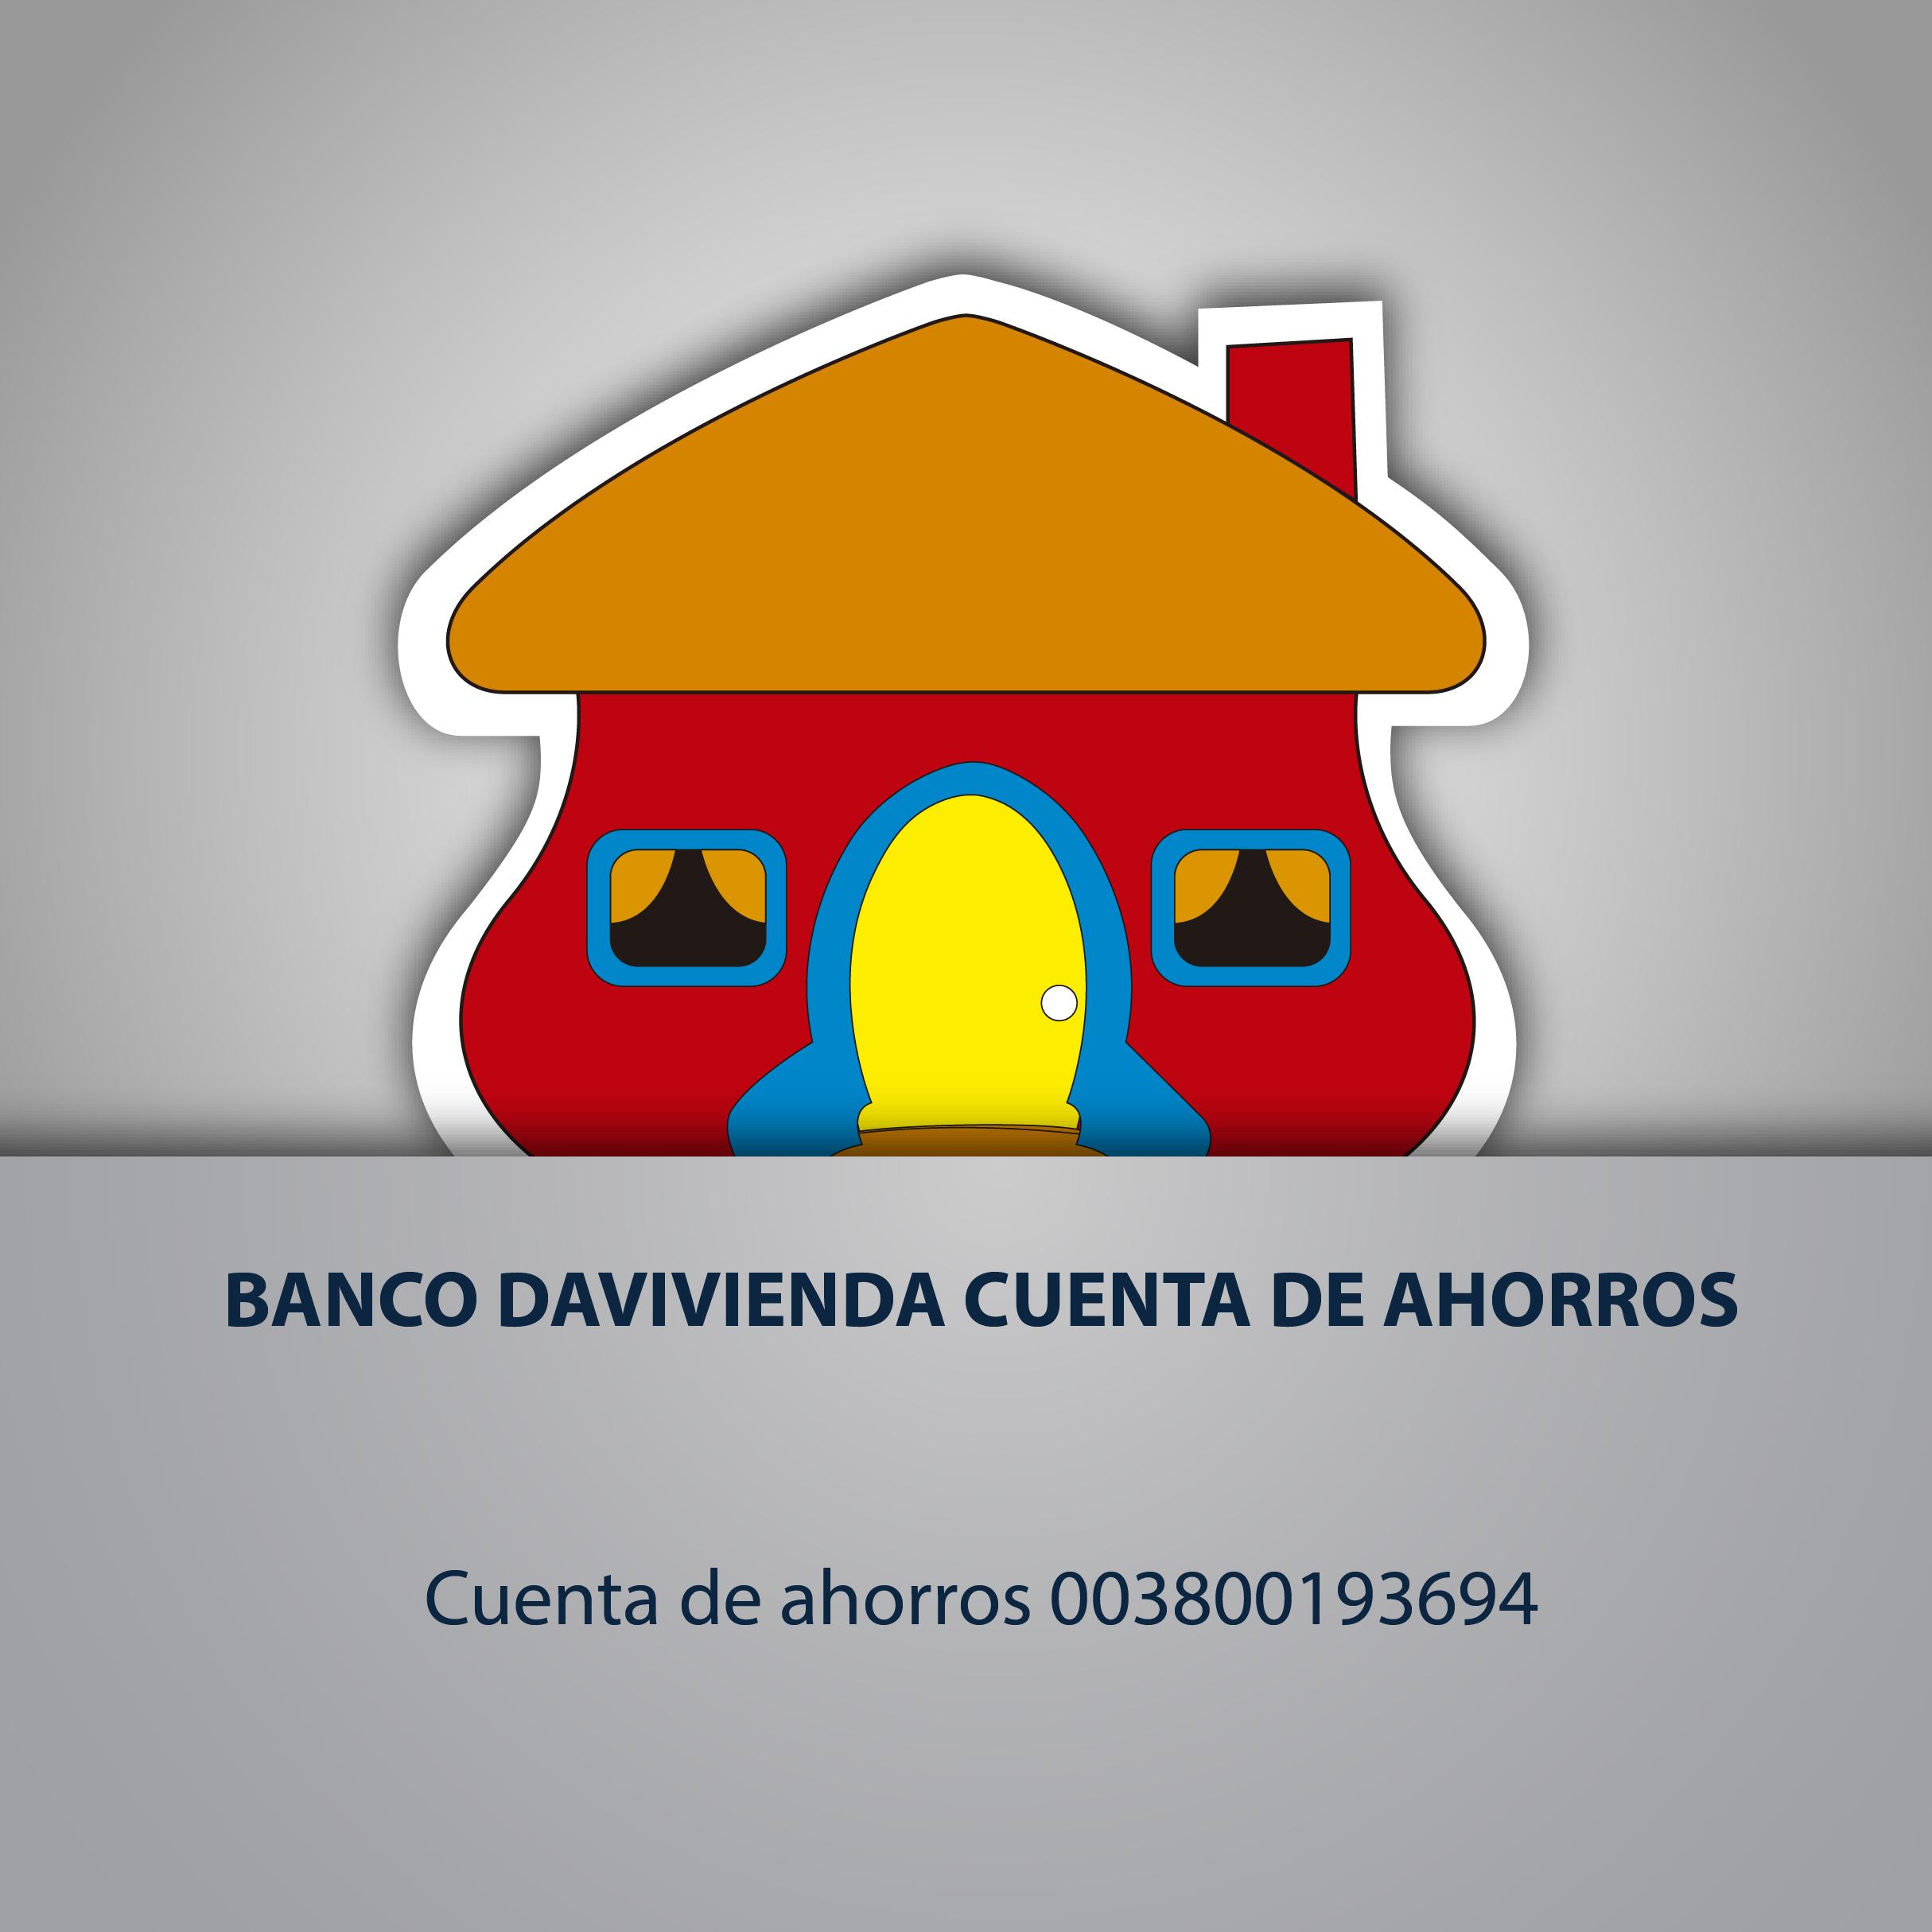 pago Davivienda